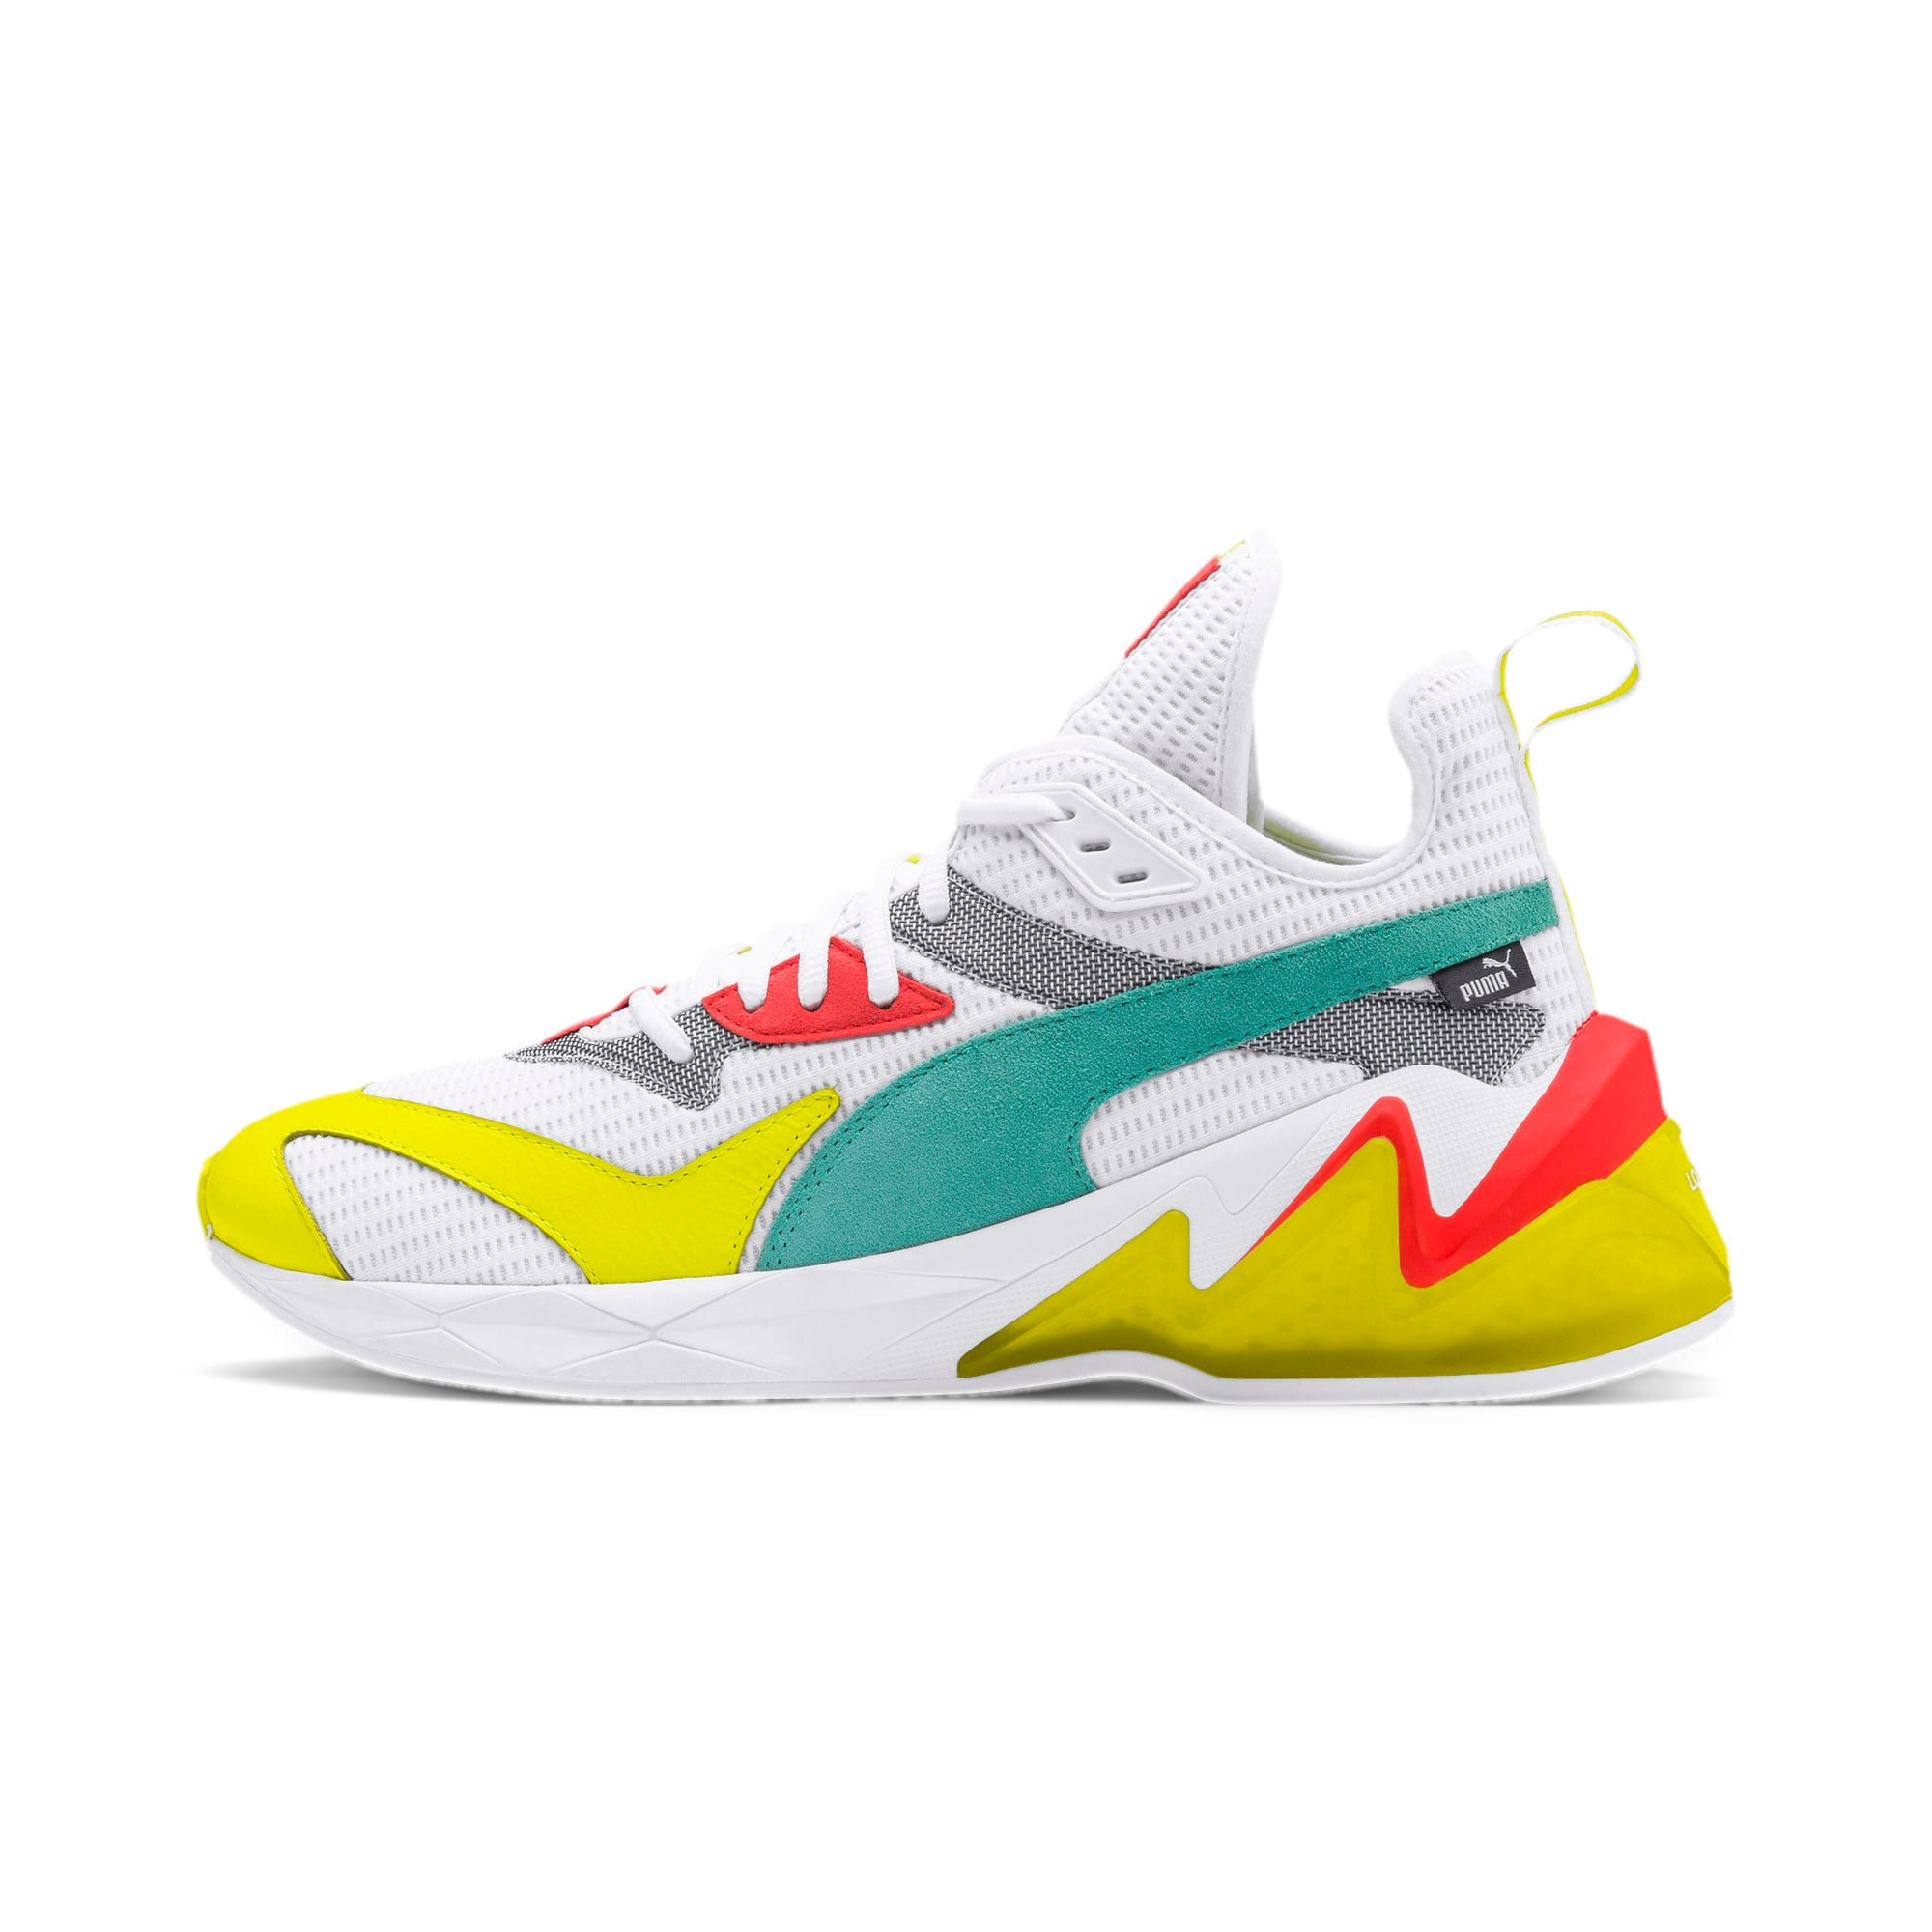 Thumbnail 1 of LQDCELL Origin Men's Training Shoes, Puma White-Yellow Alert, medium